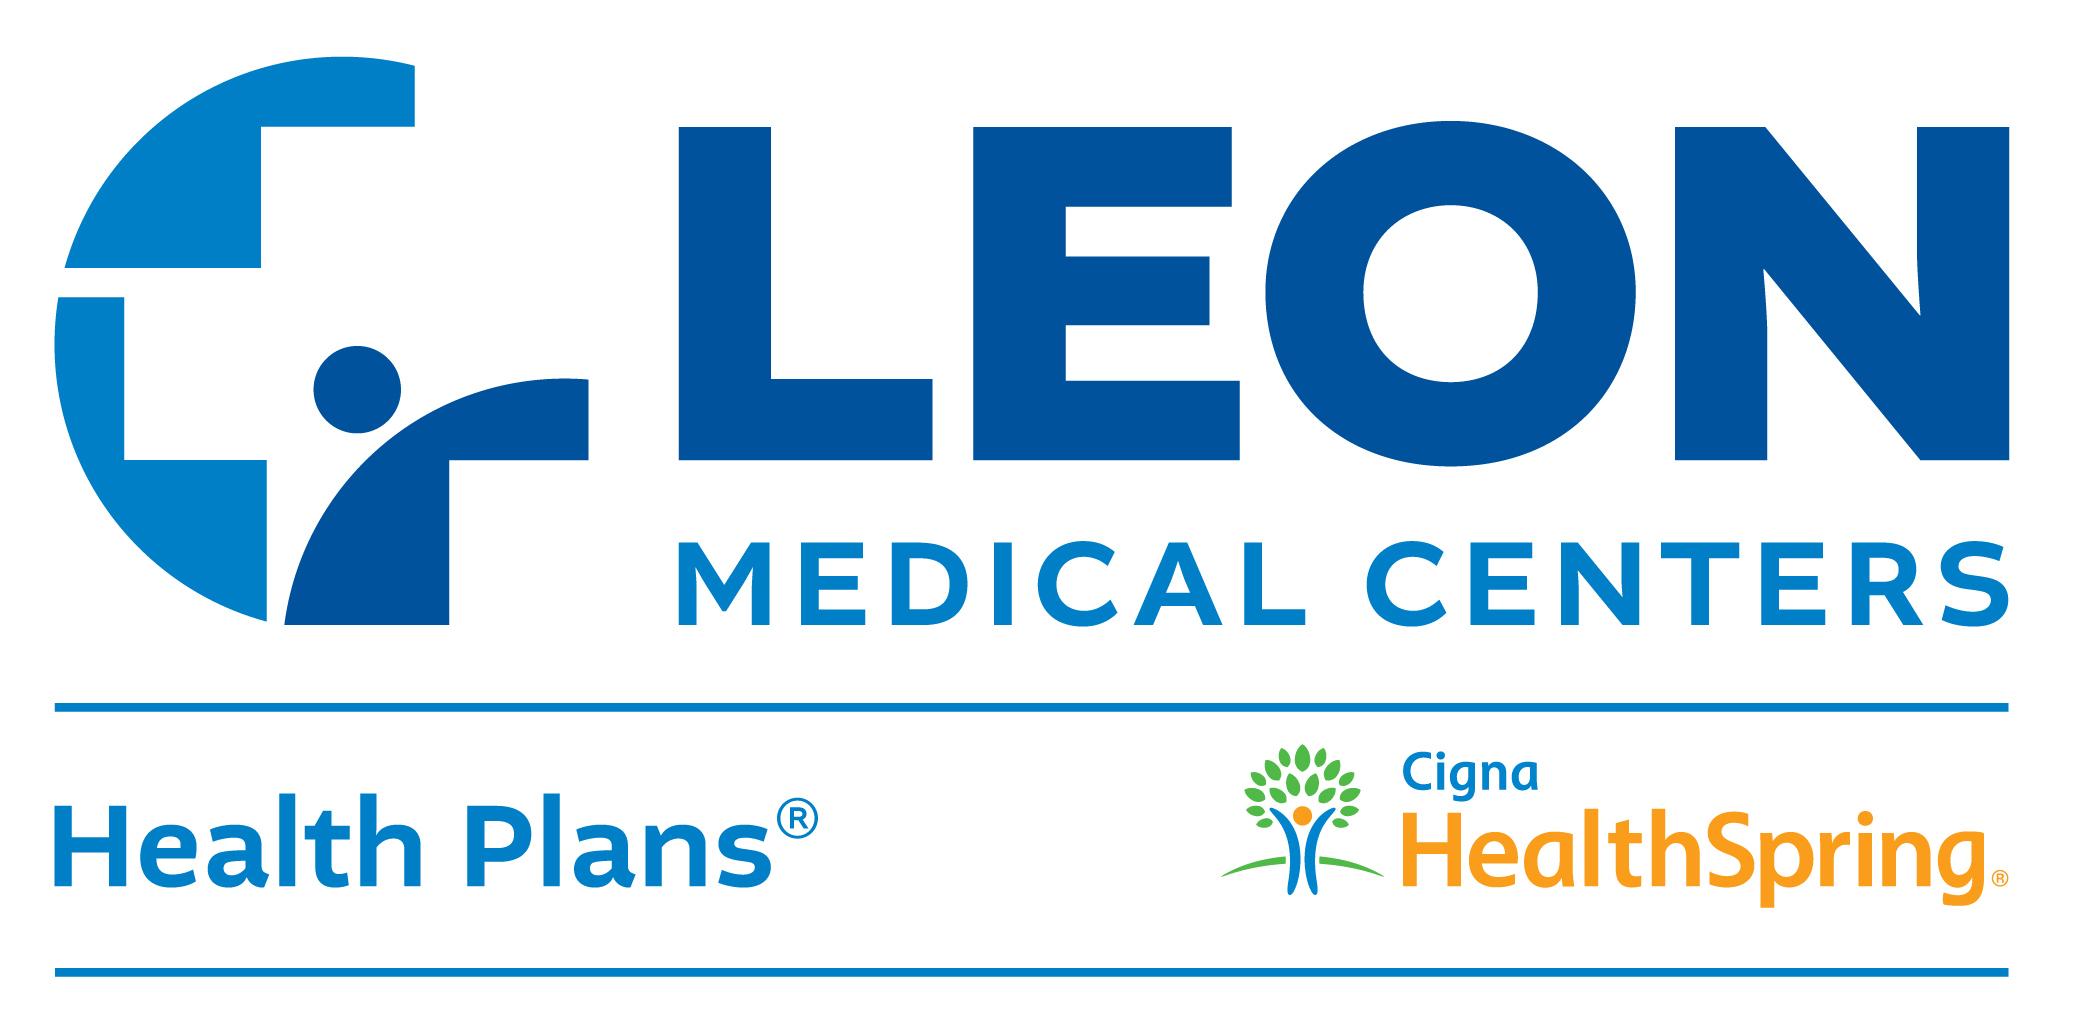 Baptist Health South Florida and Leon Medical Centers/Leon